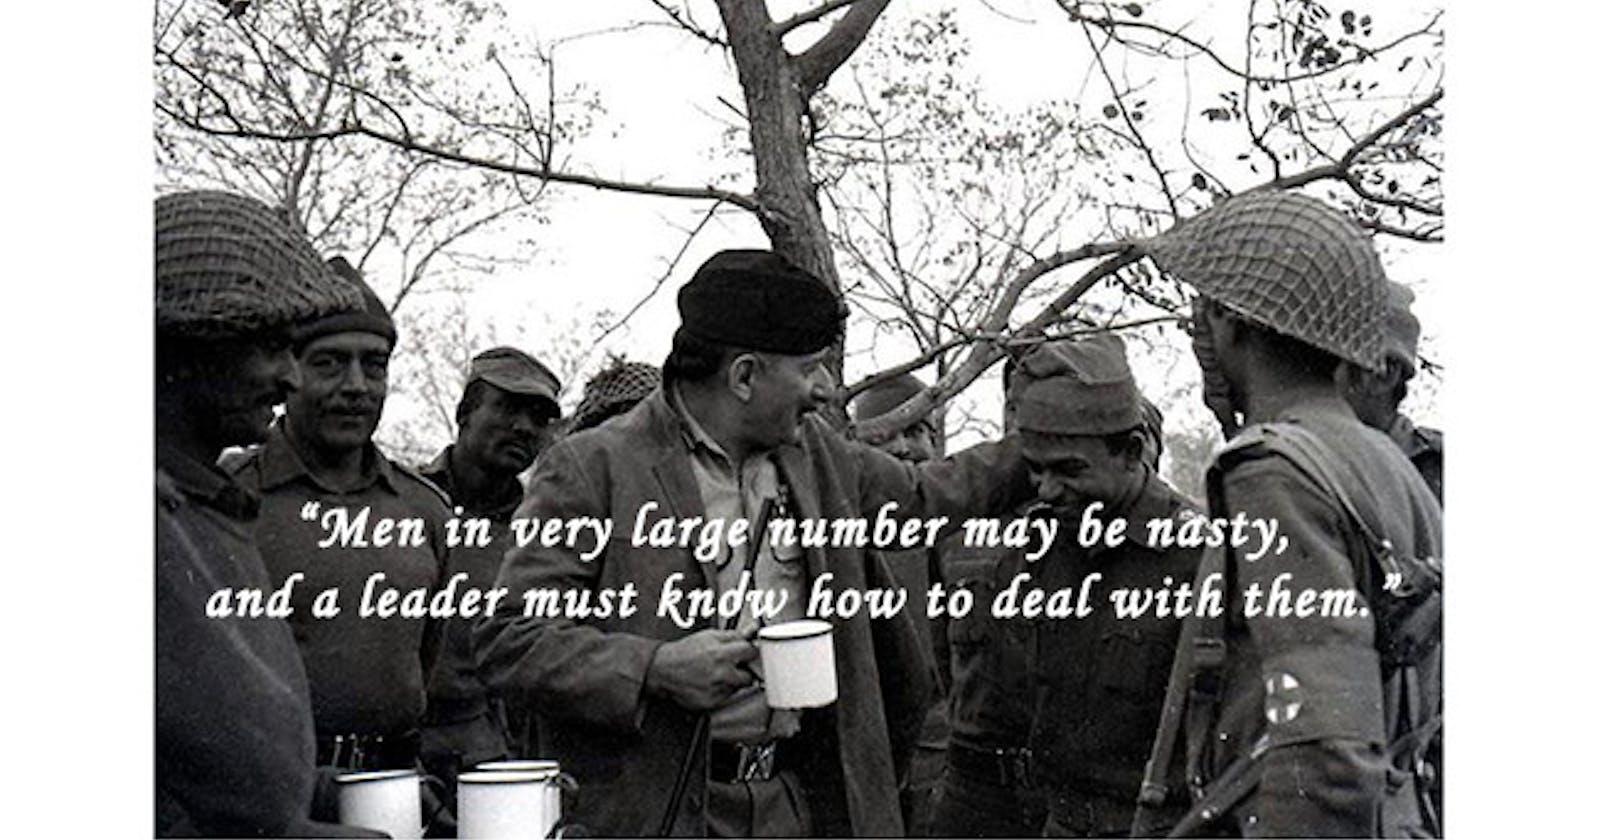 Leadership - From General Sam Manekshaw himself.